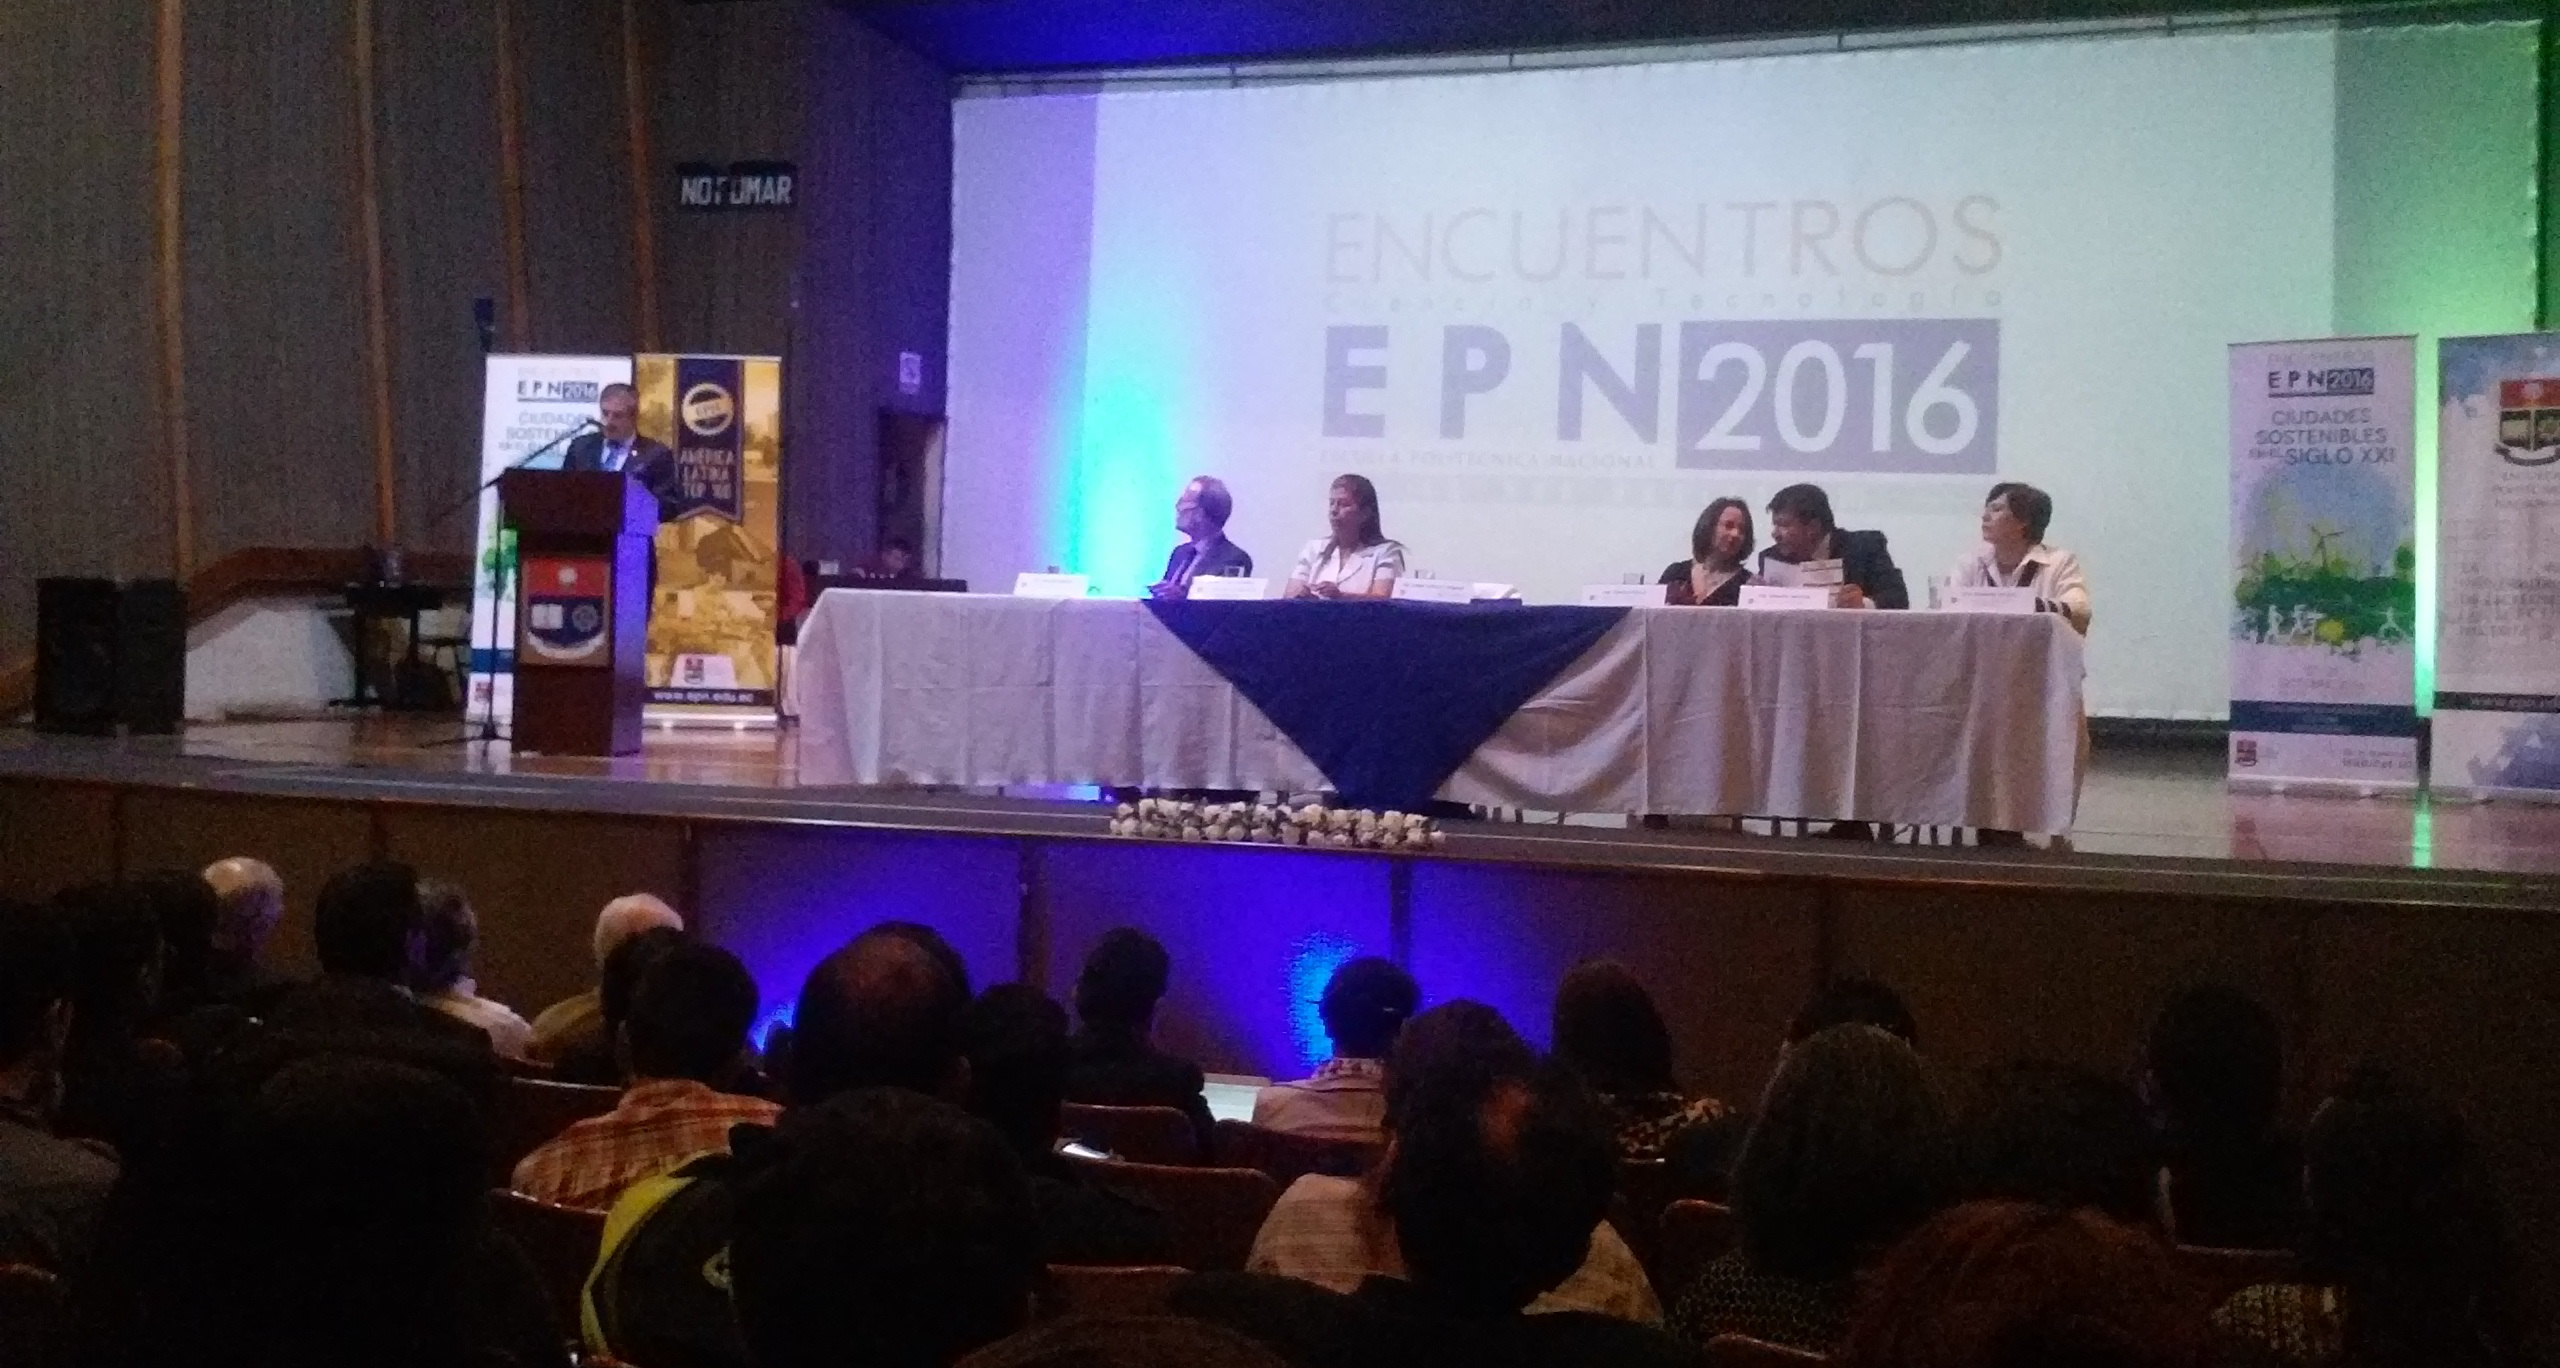 encuentros-epn-2016-inauguracion